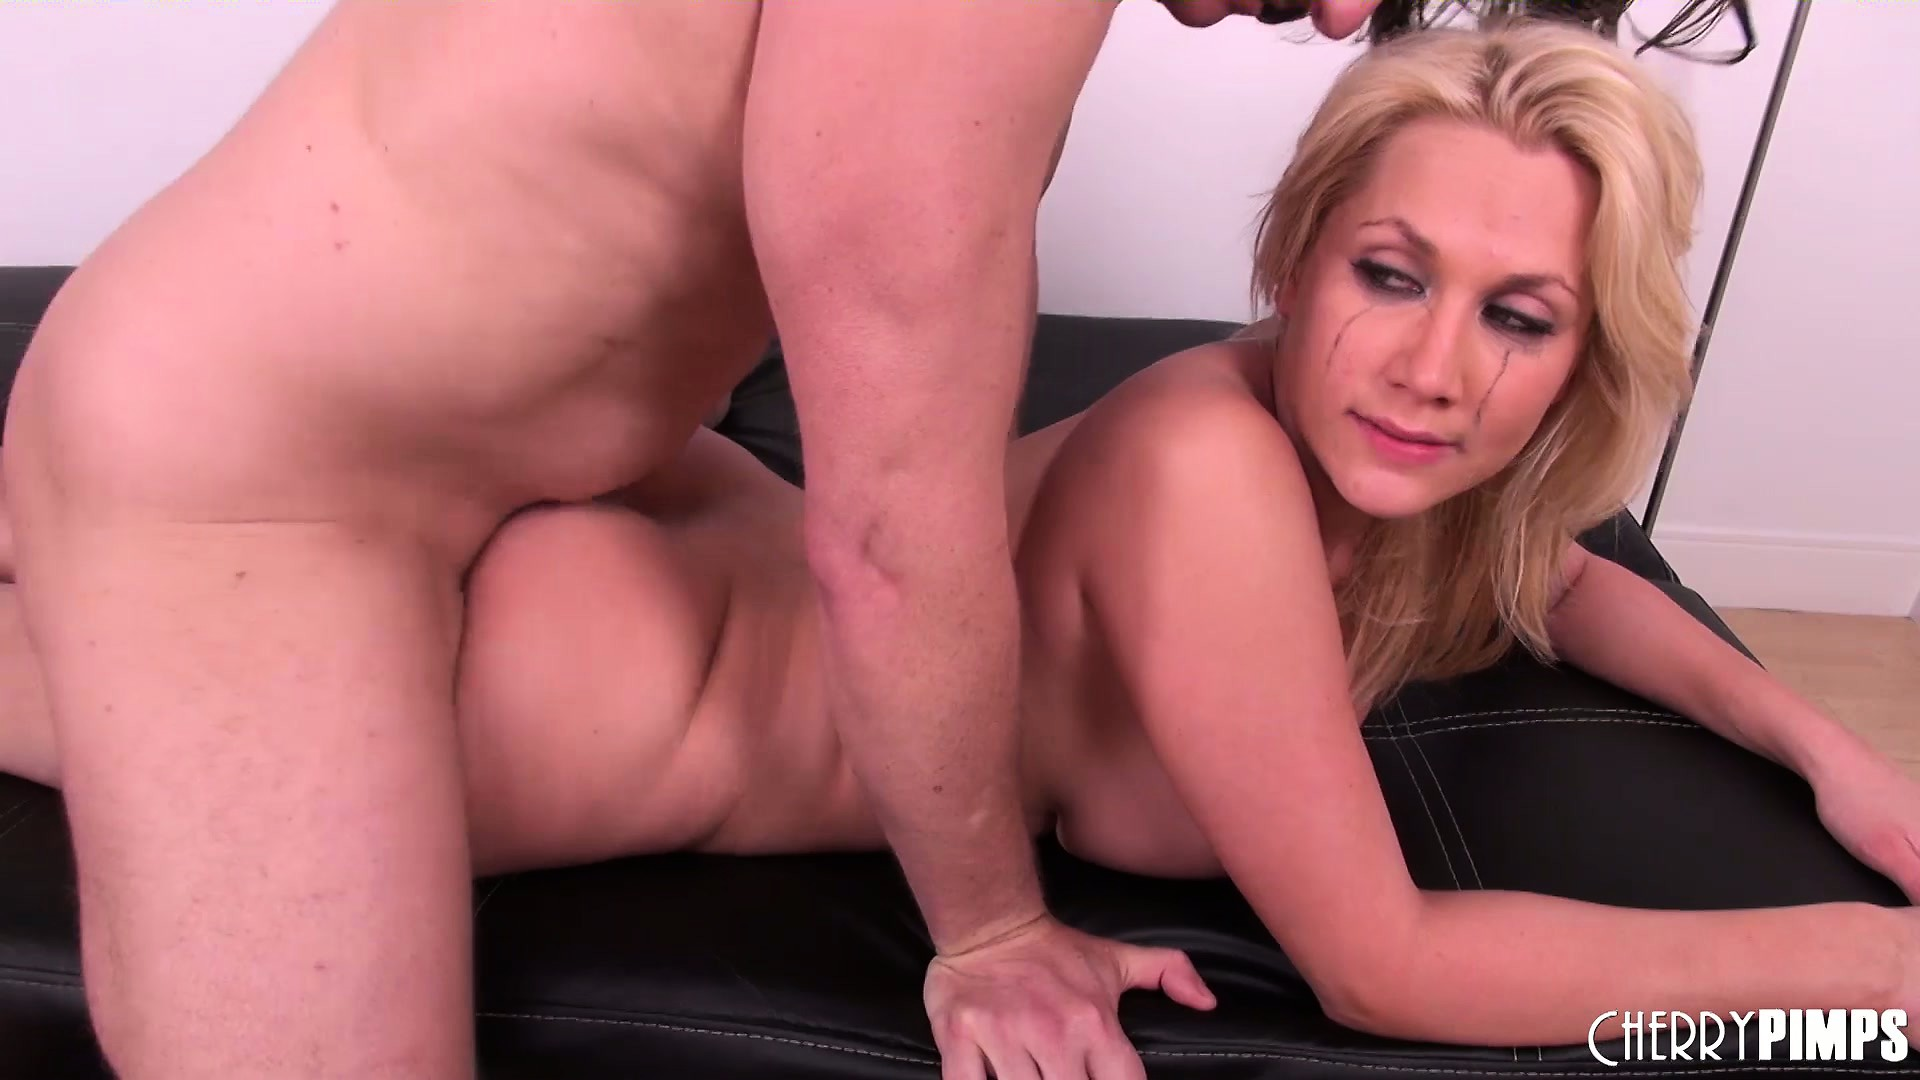 Alanah Porn Video enjoy free hd porn videos - busty blonde alanah rae gets her